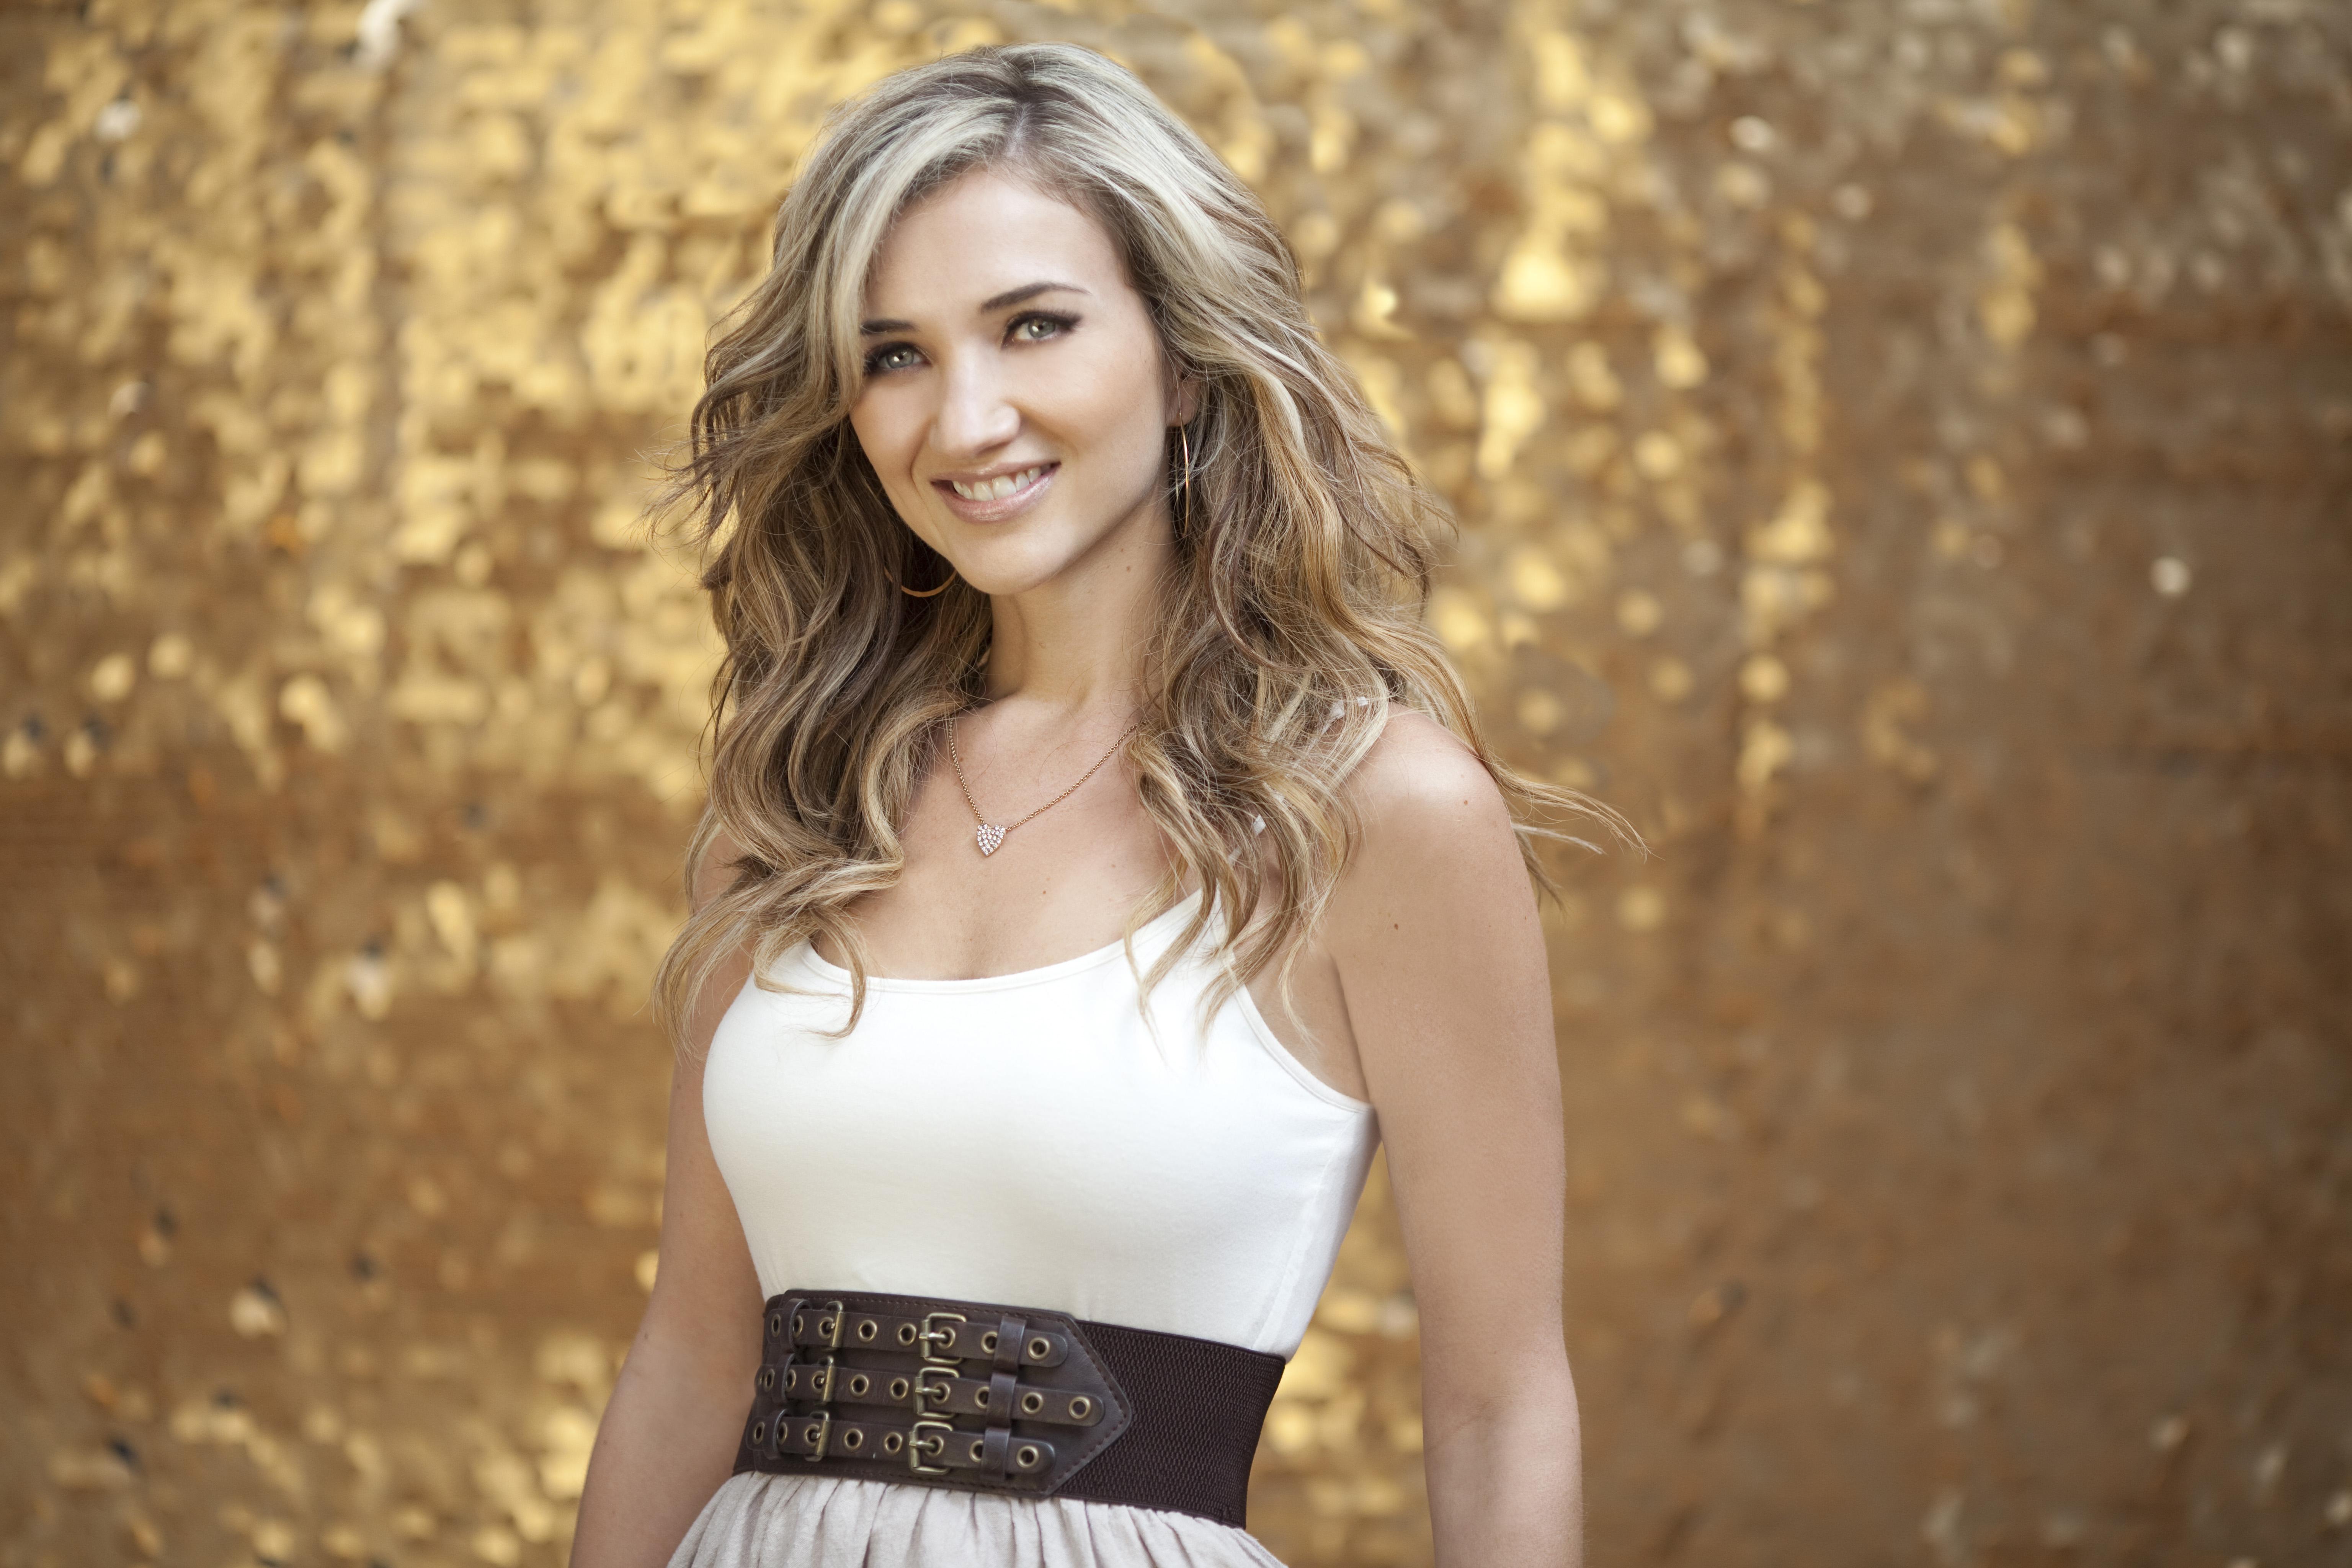 Sarah Darling impresses on music video for 'Little Umbrellas'